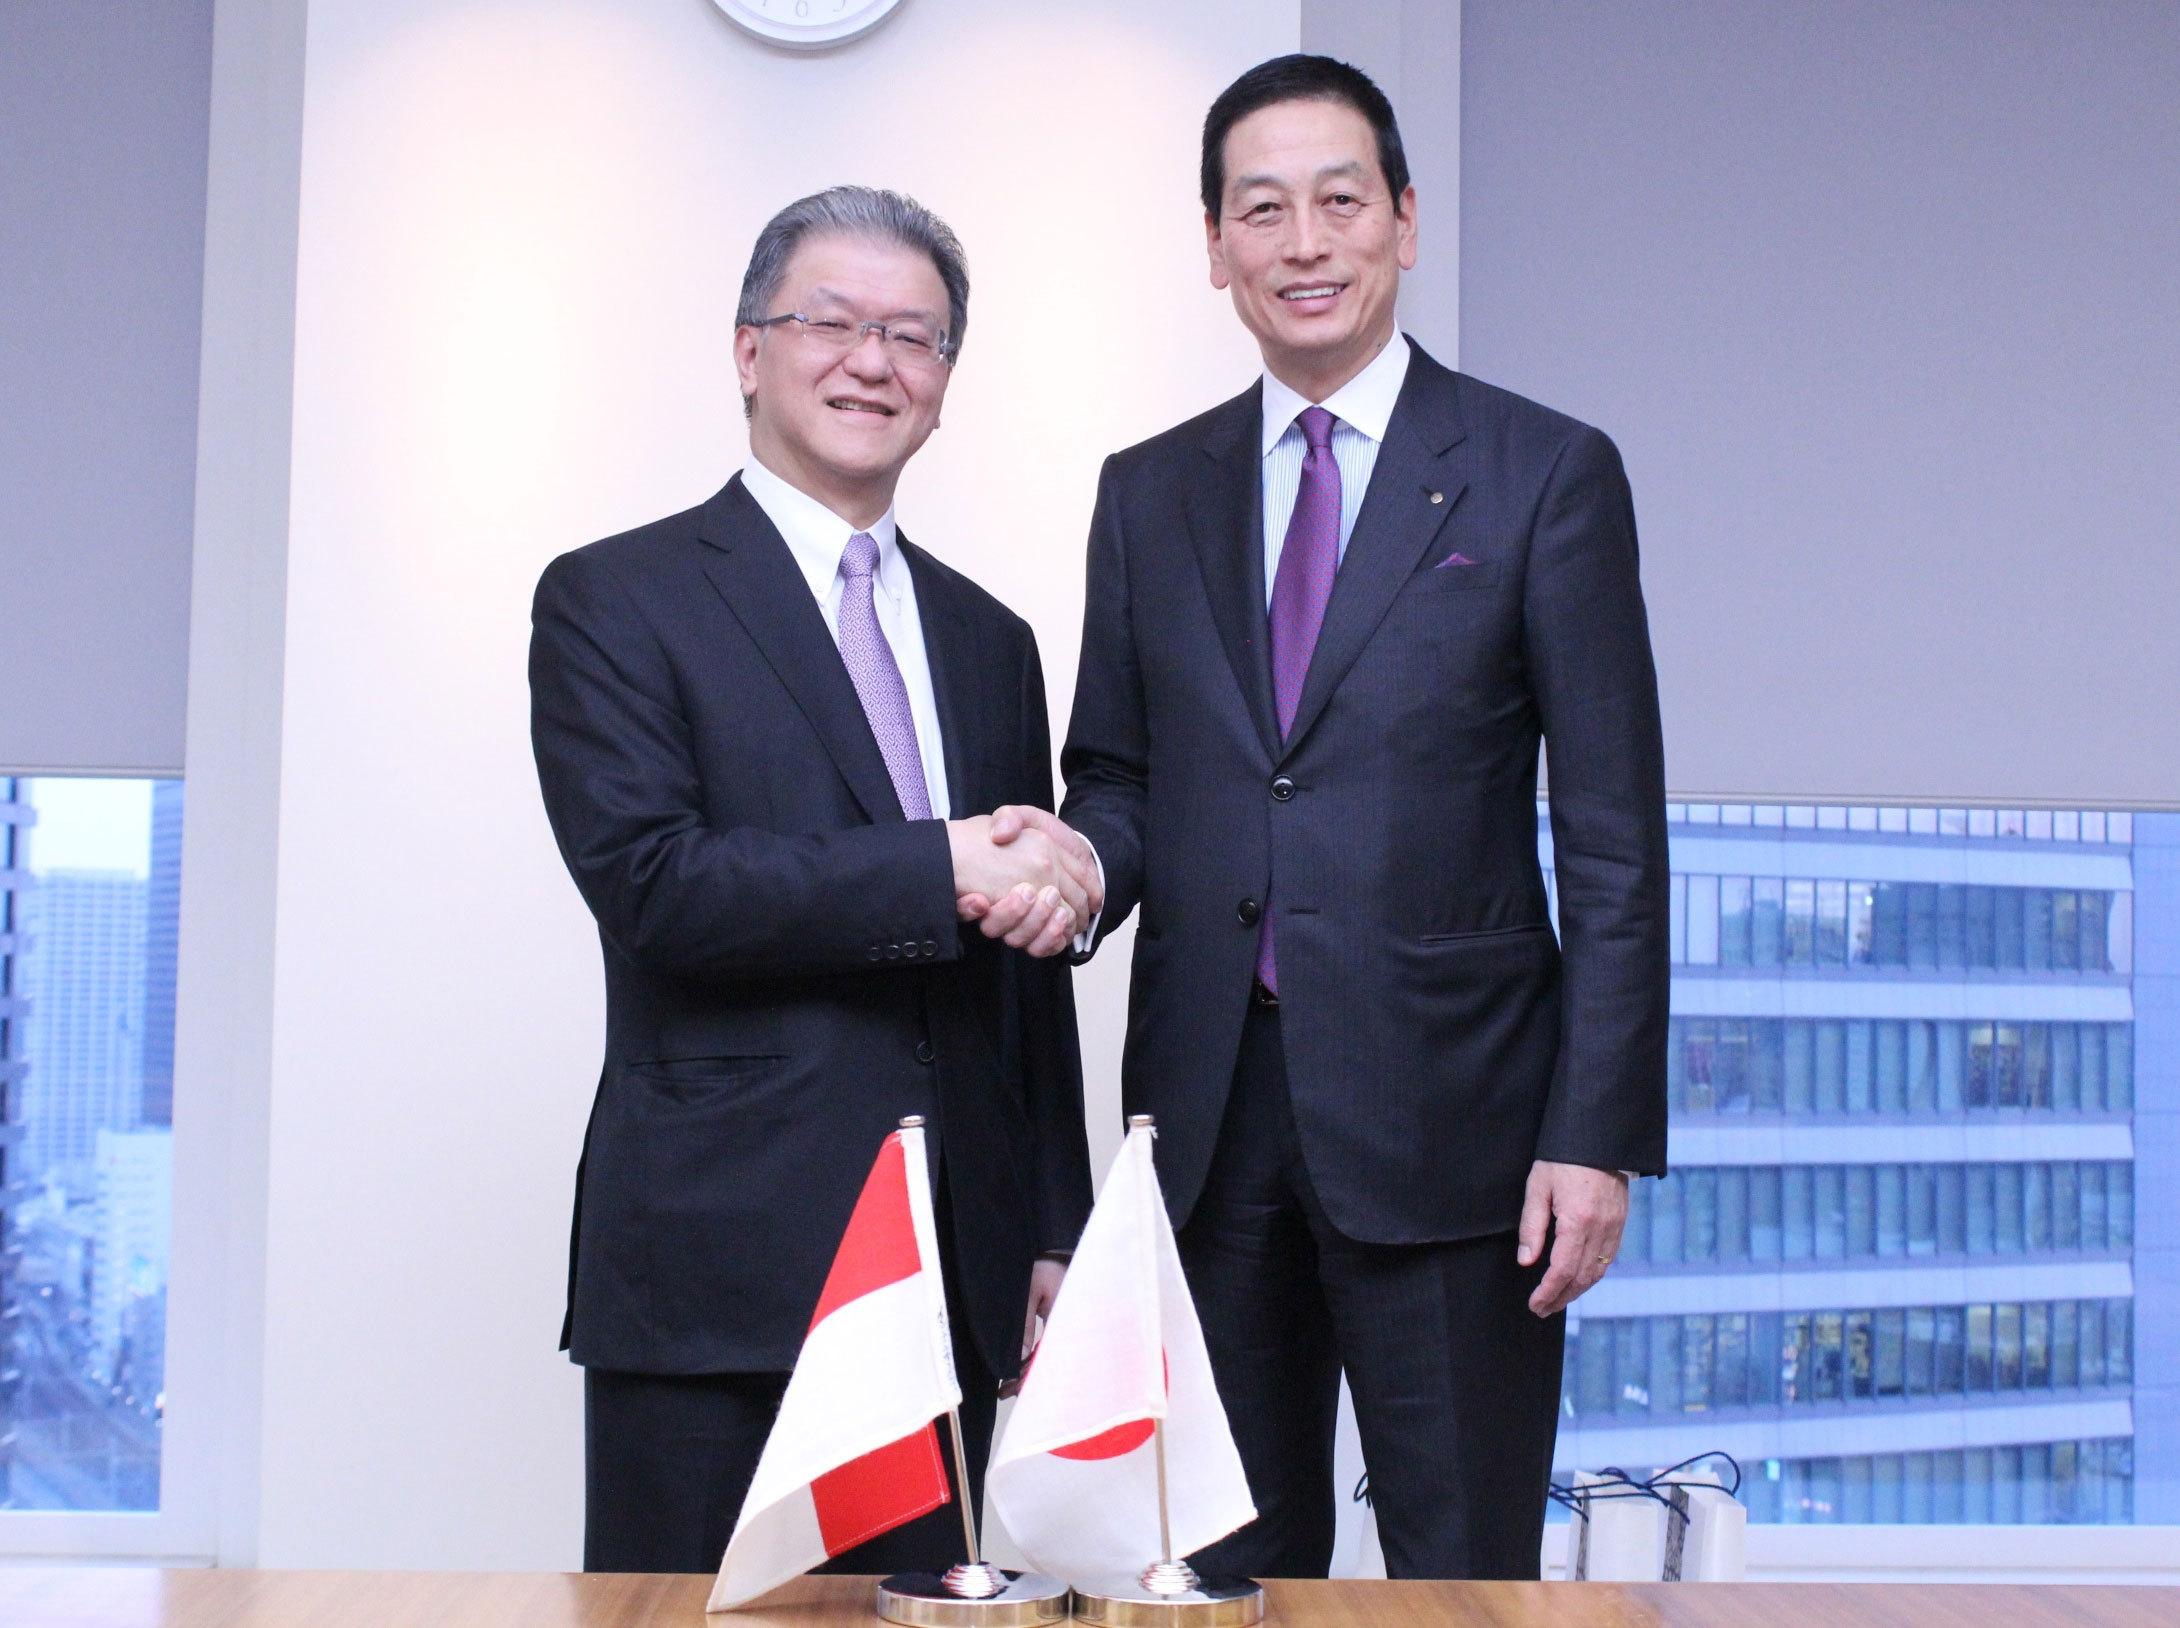 Masahiko Uotani, President and CEO of Shiseido (right) shakes hands with Franky O. Widjaja, Vice Chairman of Sinar Mas upon establishment of new joint venture company. (Photo: Business Wire)